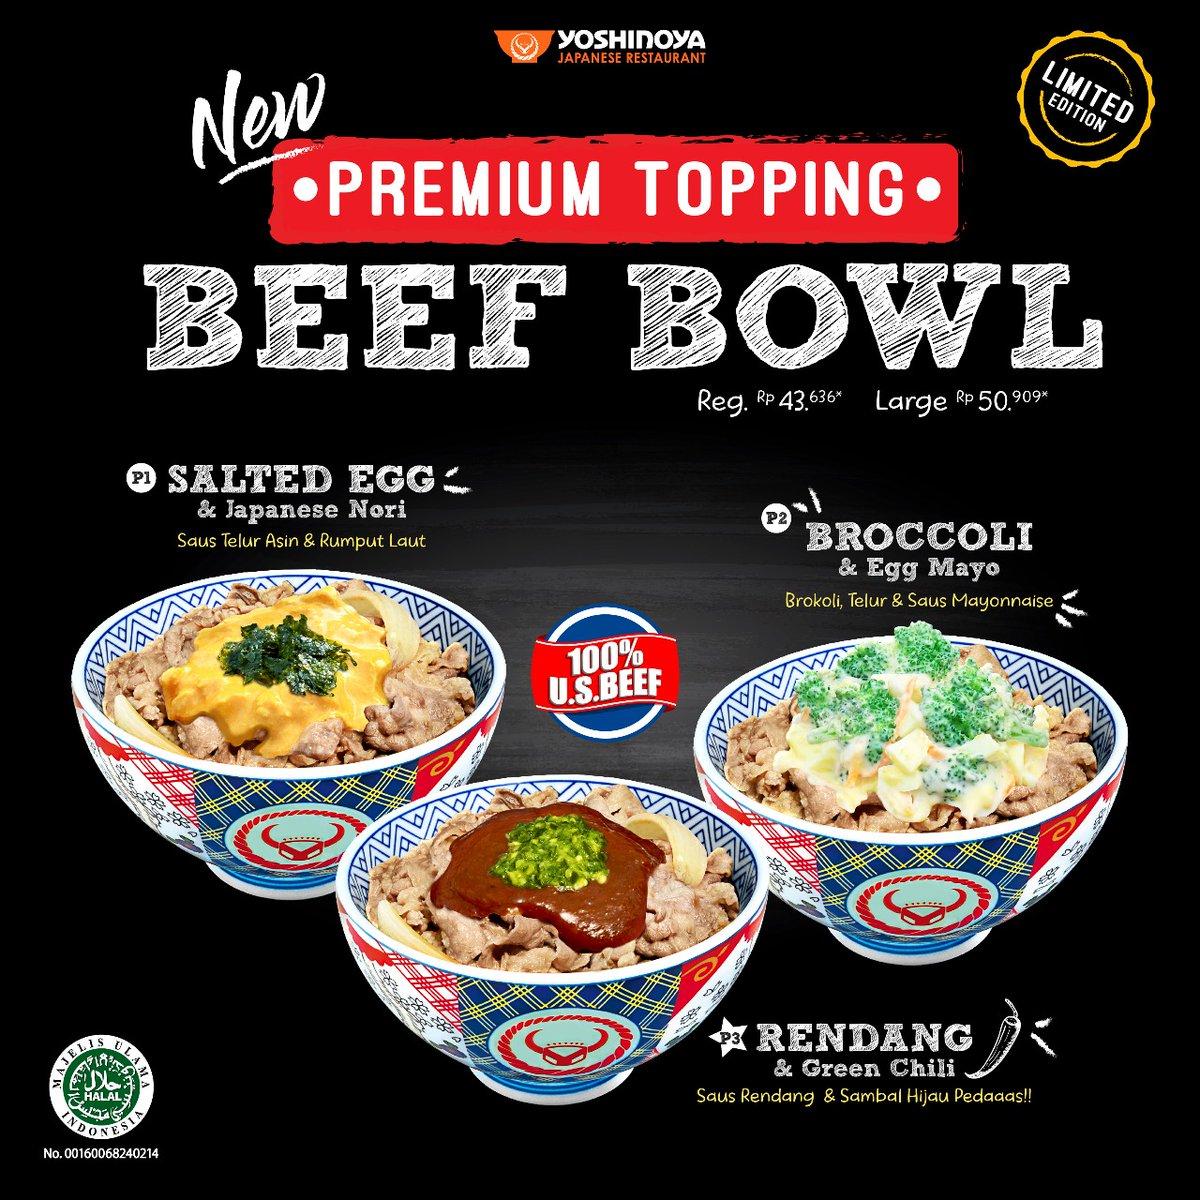 Yoshinoya - Promo Beef Bowl New Premium Topping Harga Mulai 43 Ribuan